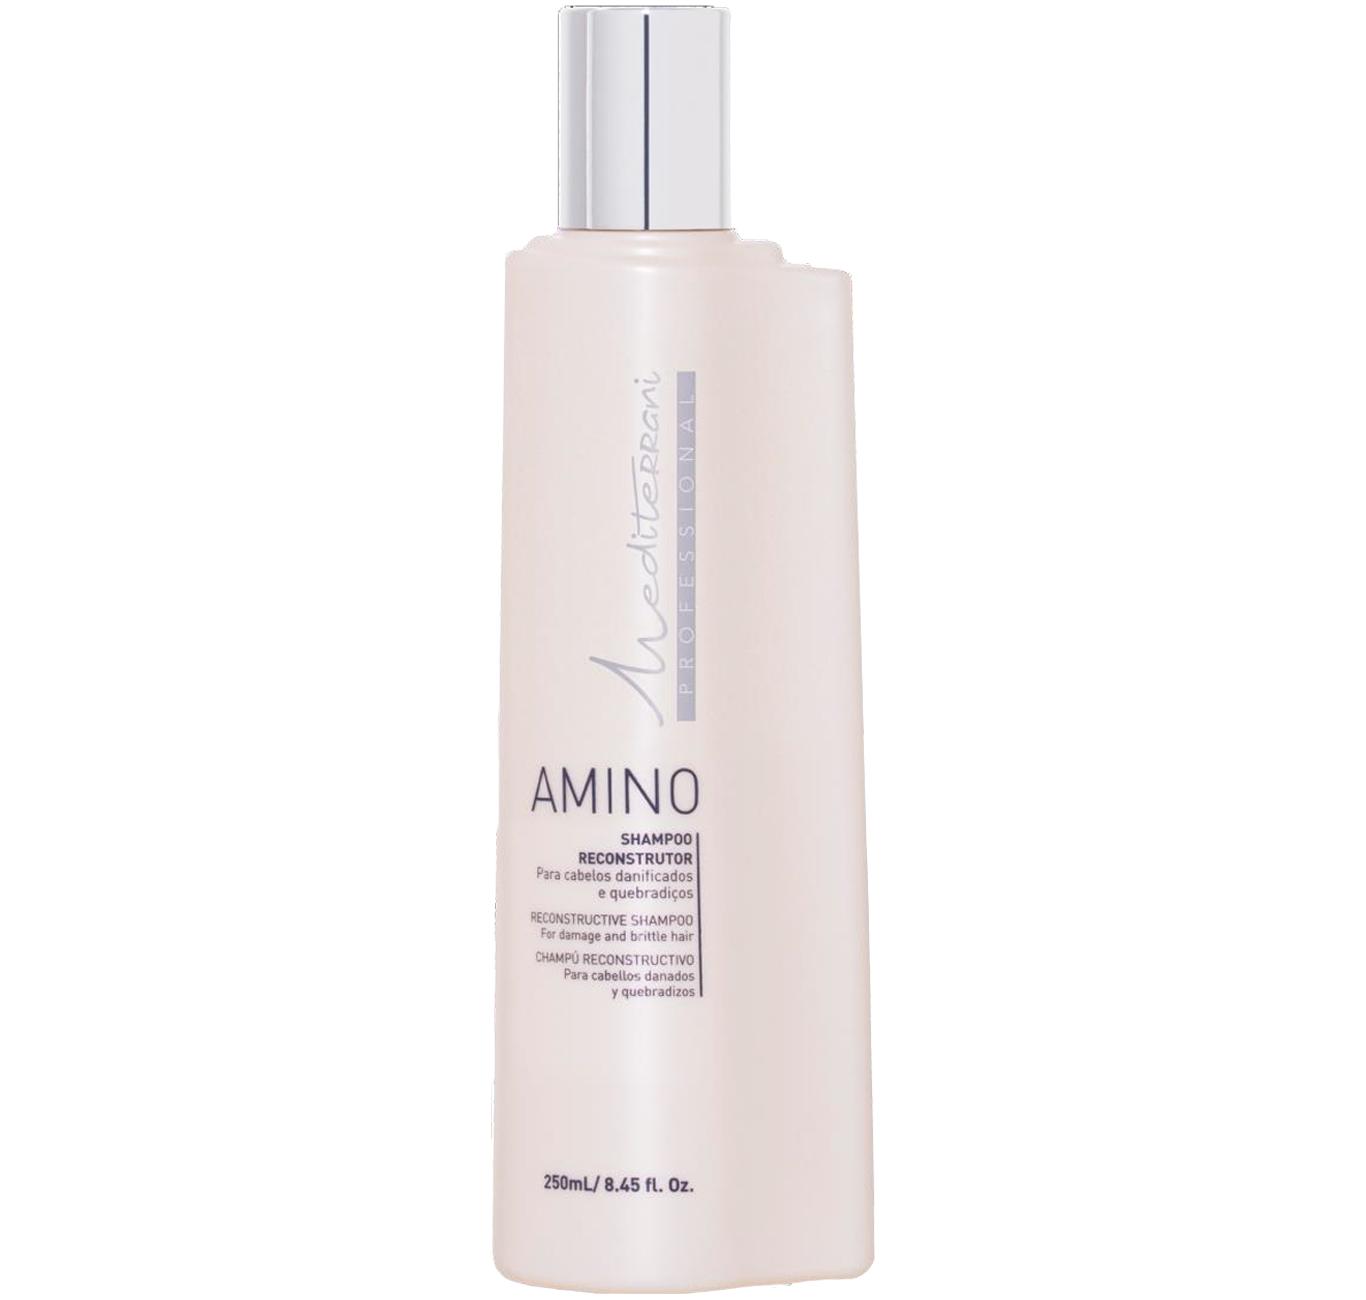 Amino Shampoo Reconstrutor 250 ml Mediterrani